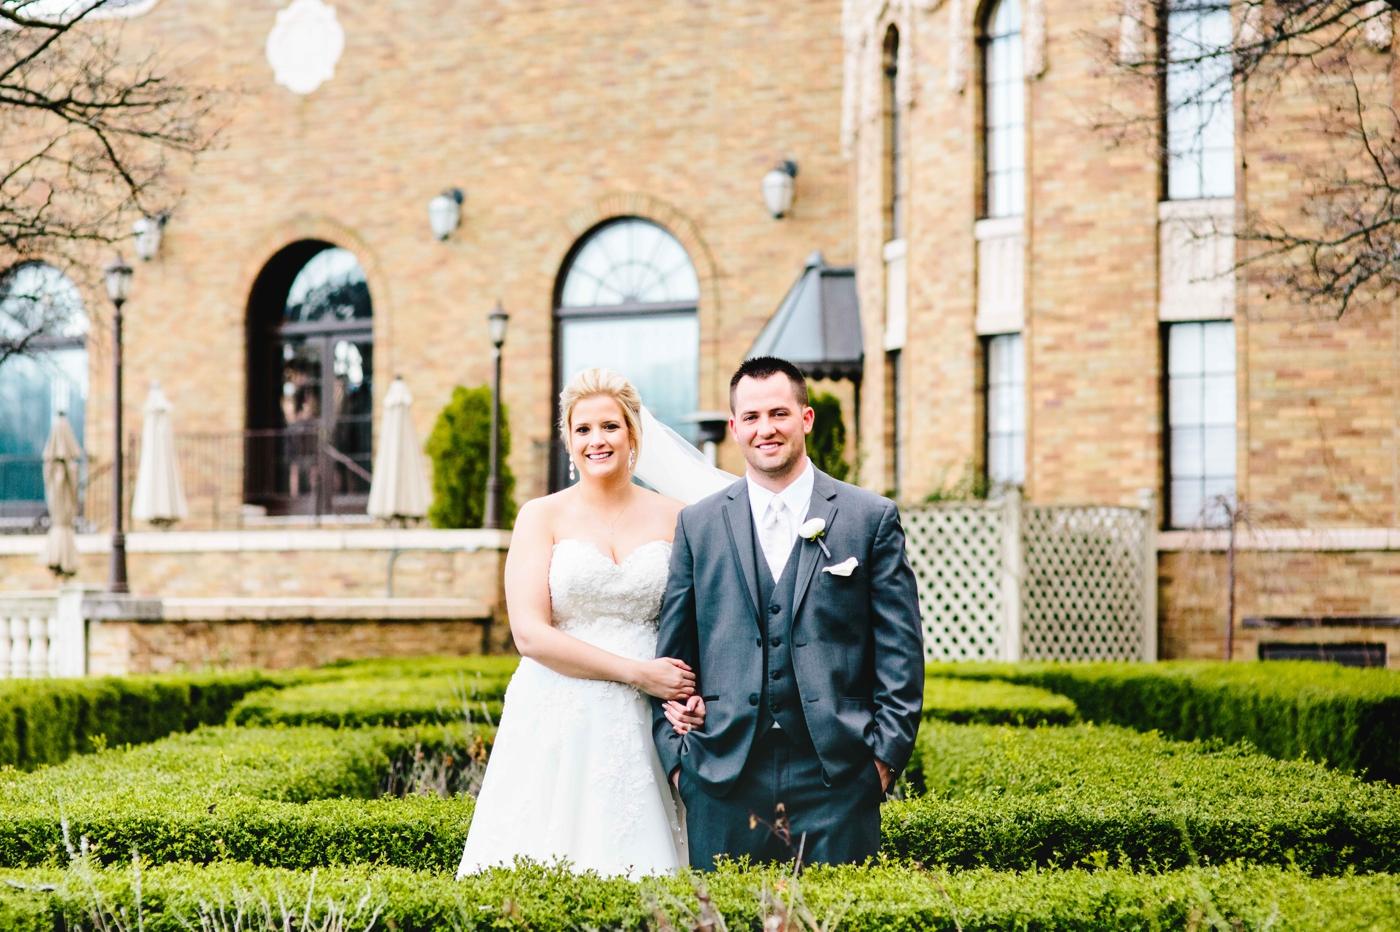 chicago-fine-art-wedding-photography-cassady16